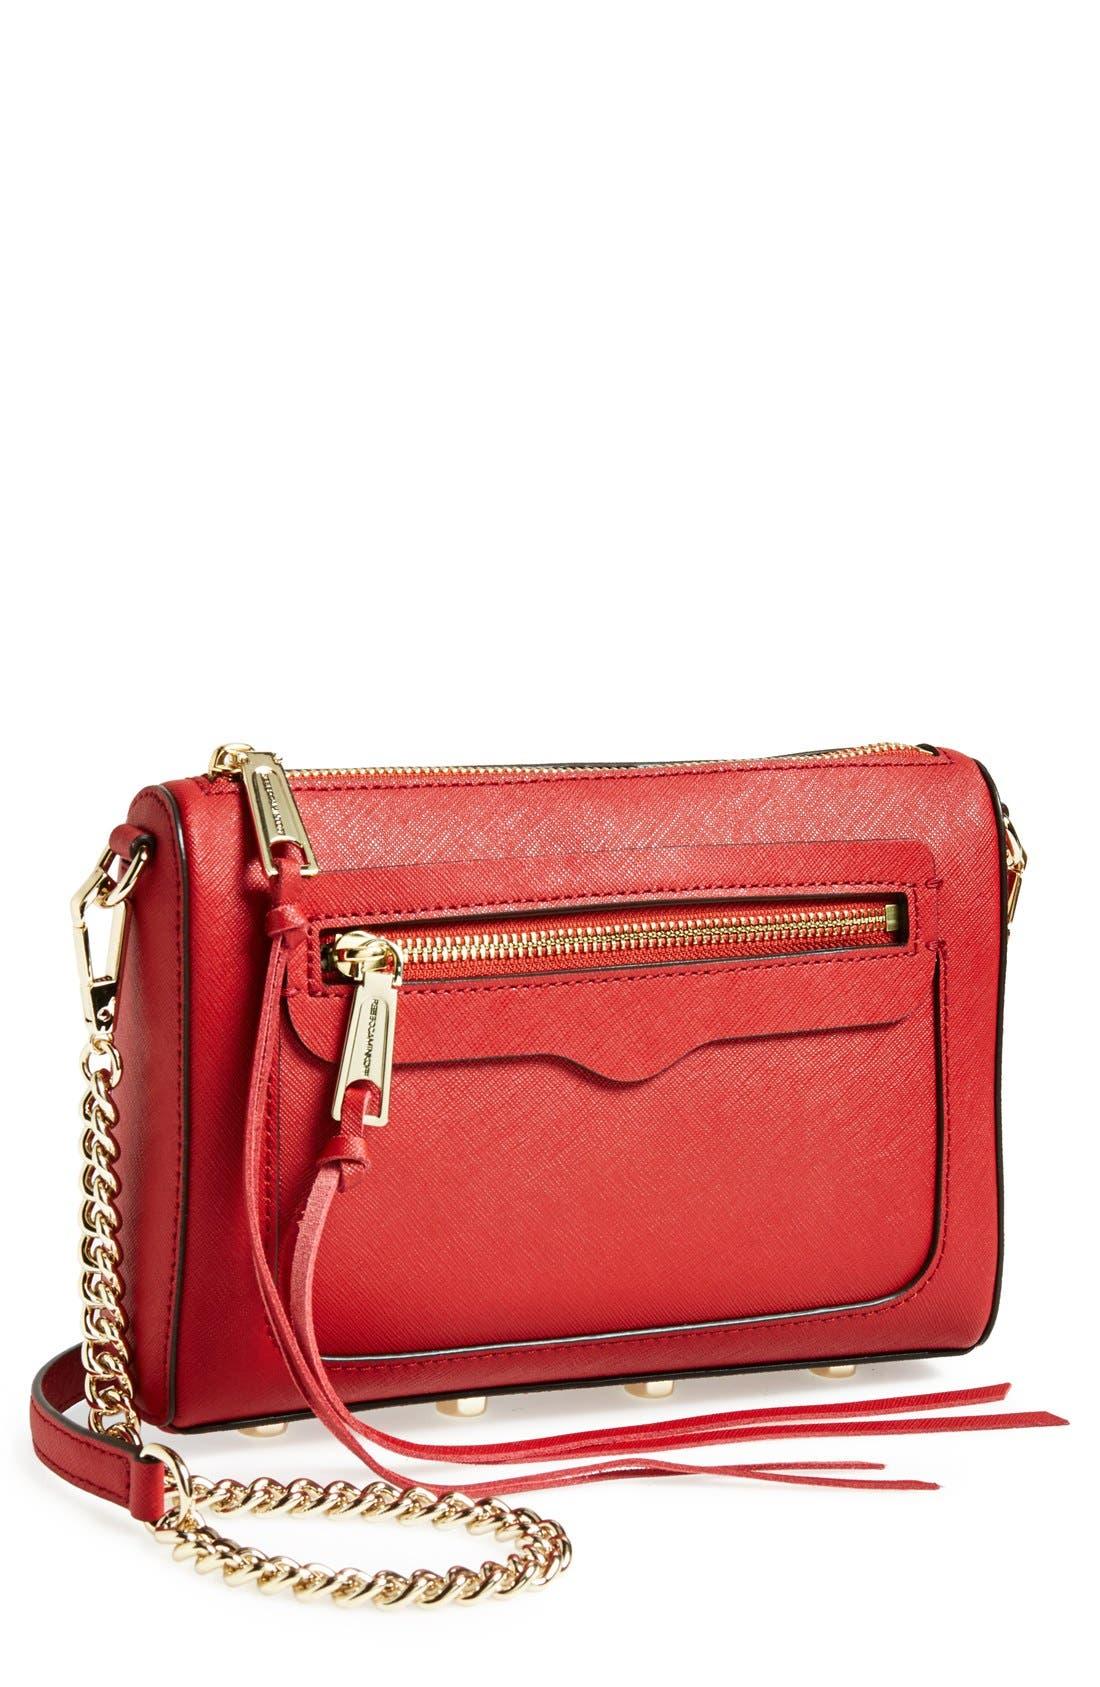 'Avery' Crossbody Bag, Main, color, 600